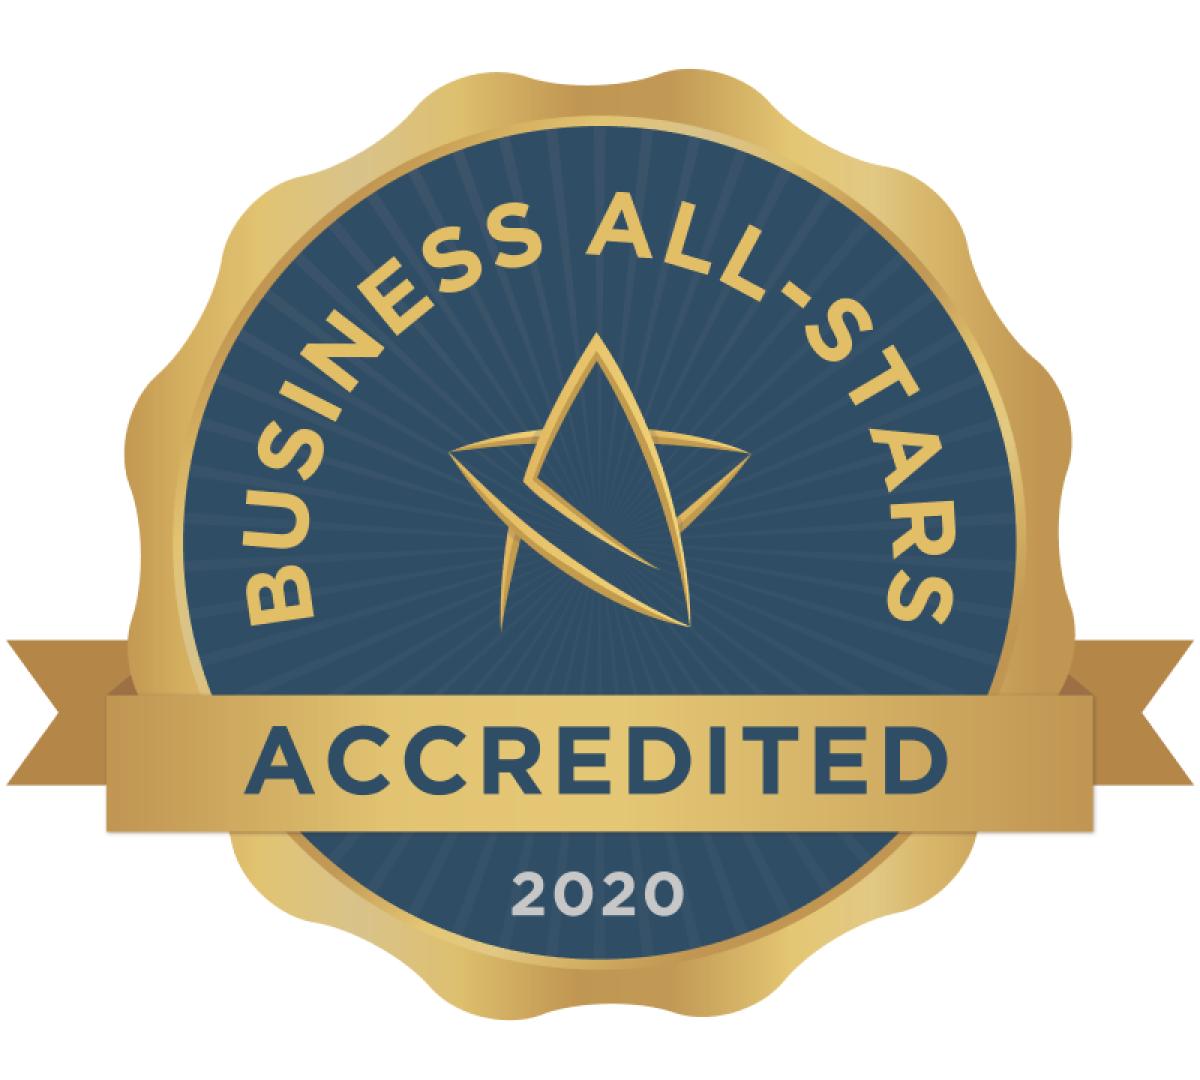 Irish Business All-Stars Award 2020